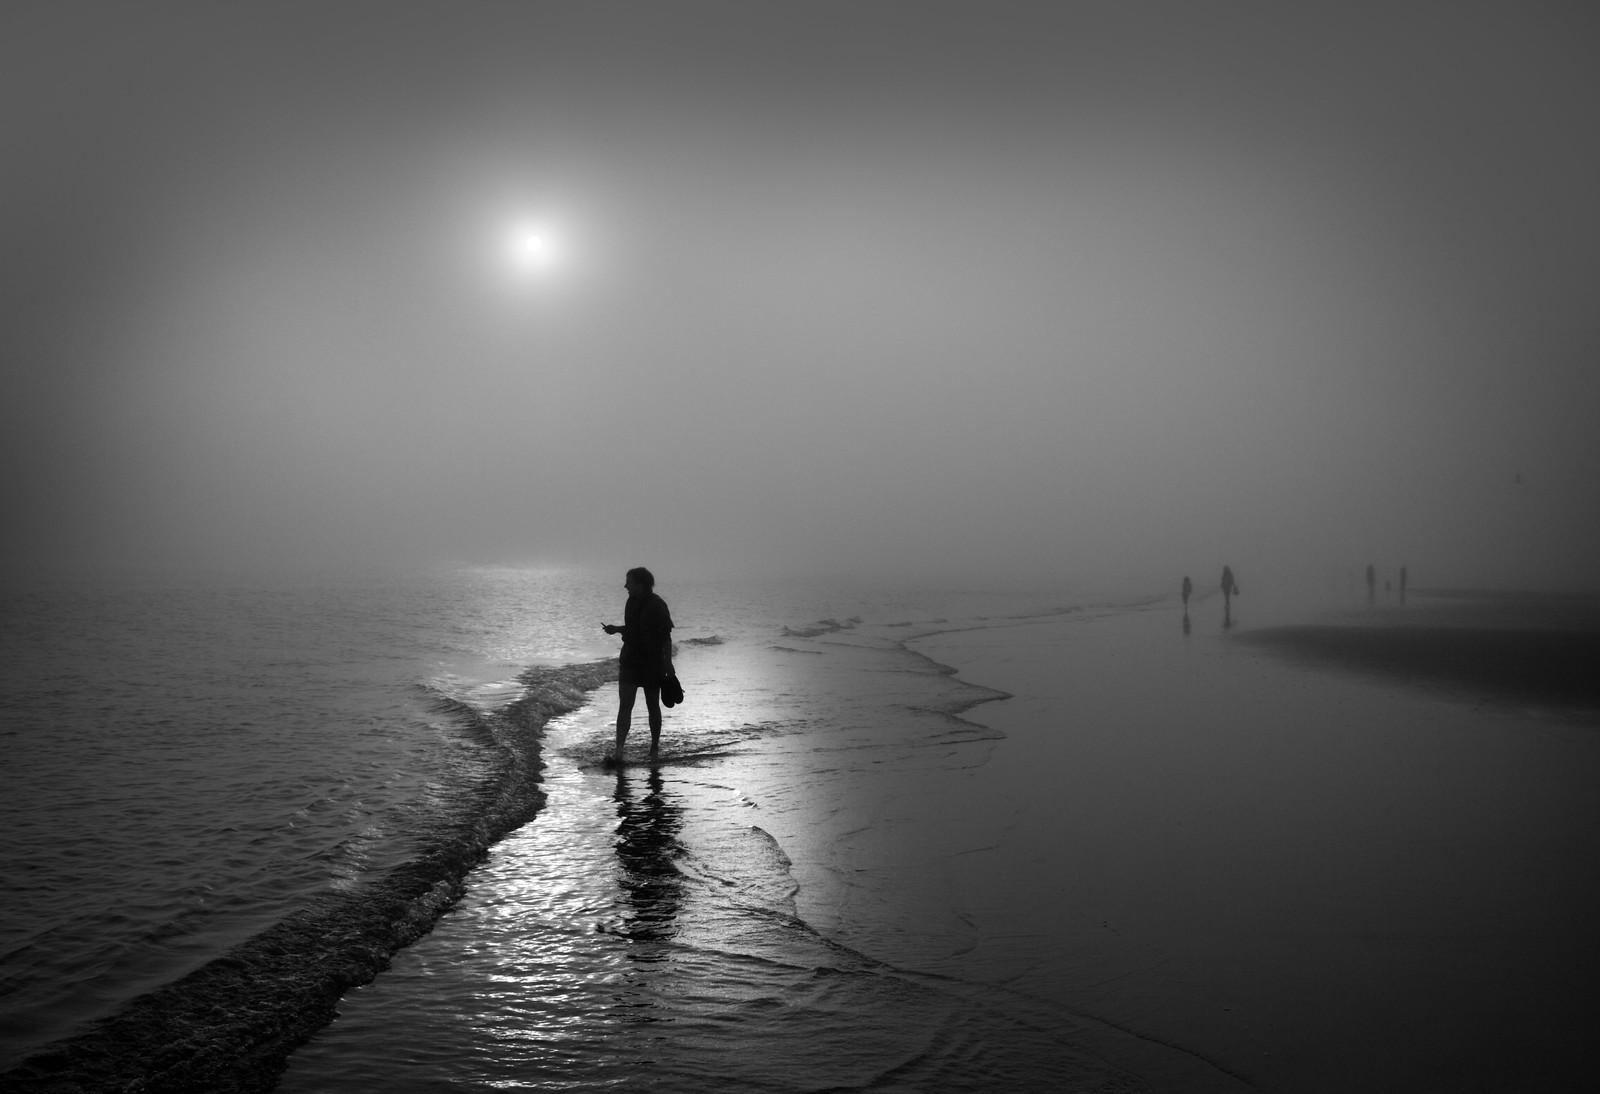 Brighton Beach - Low Tide and Sea Fog